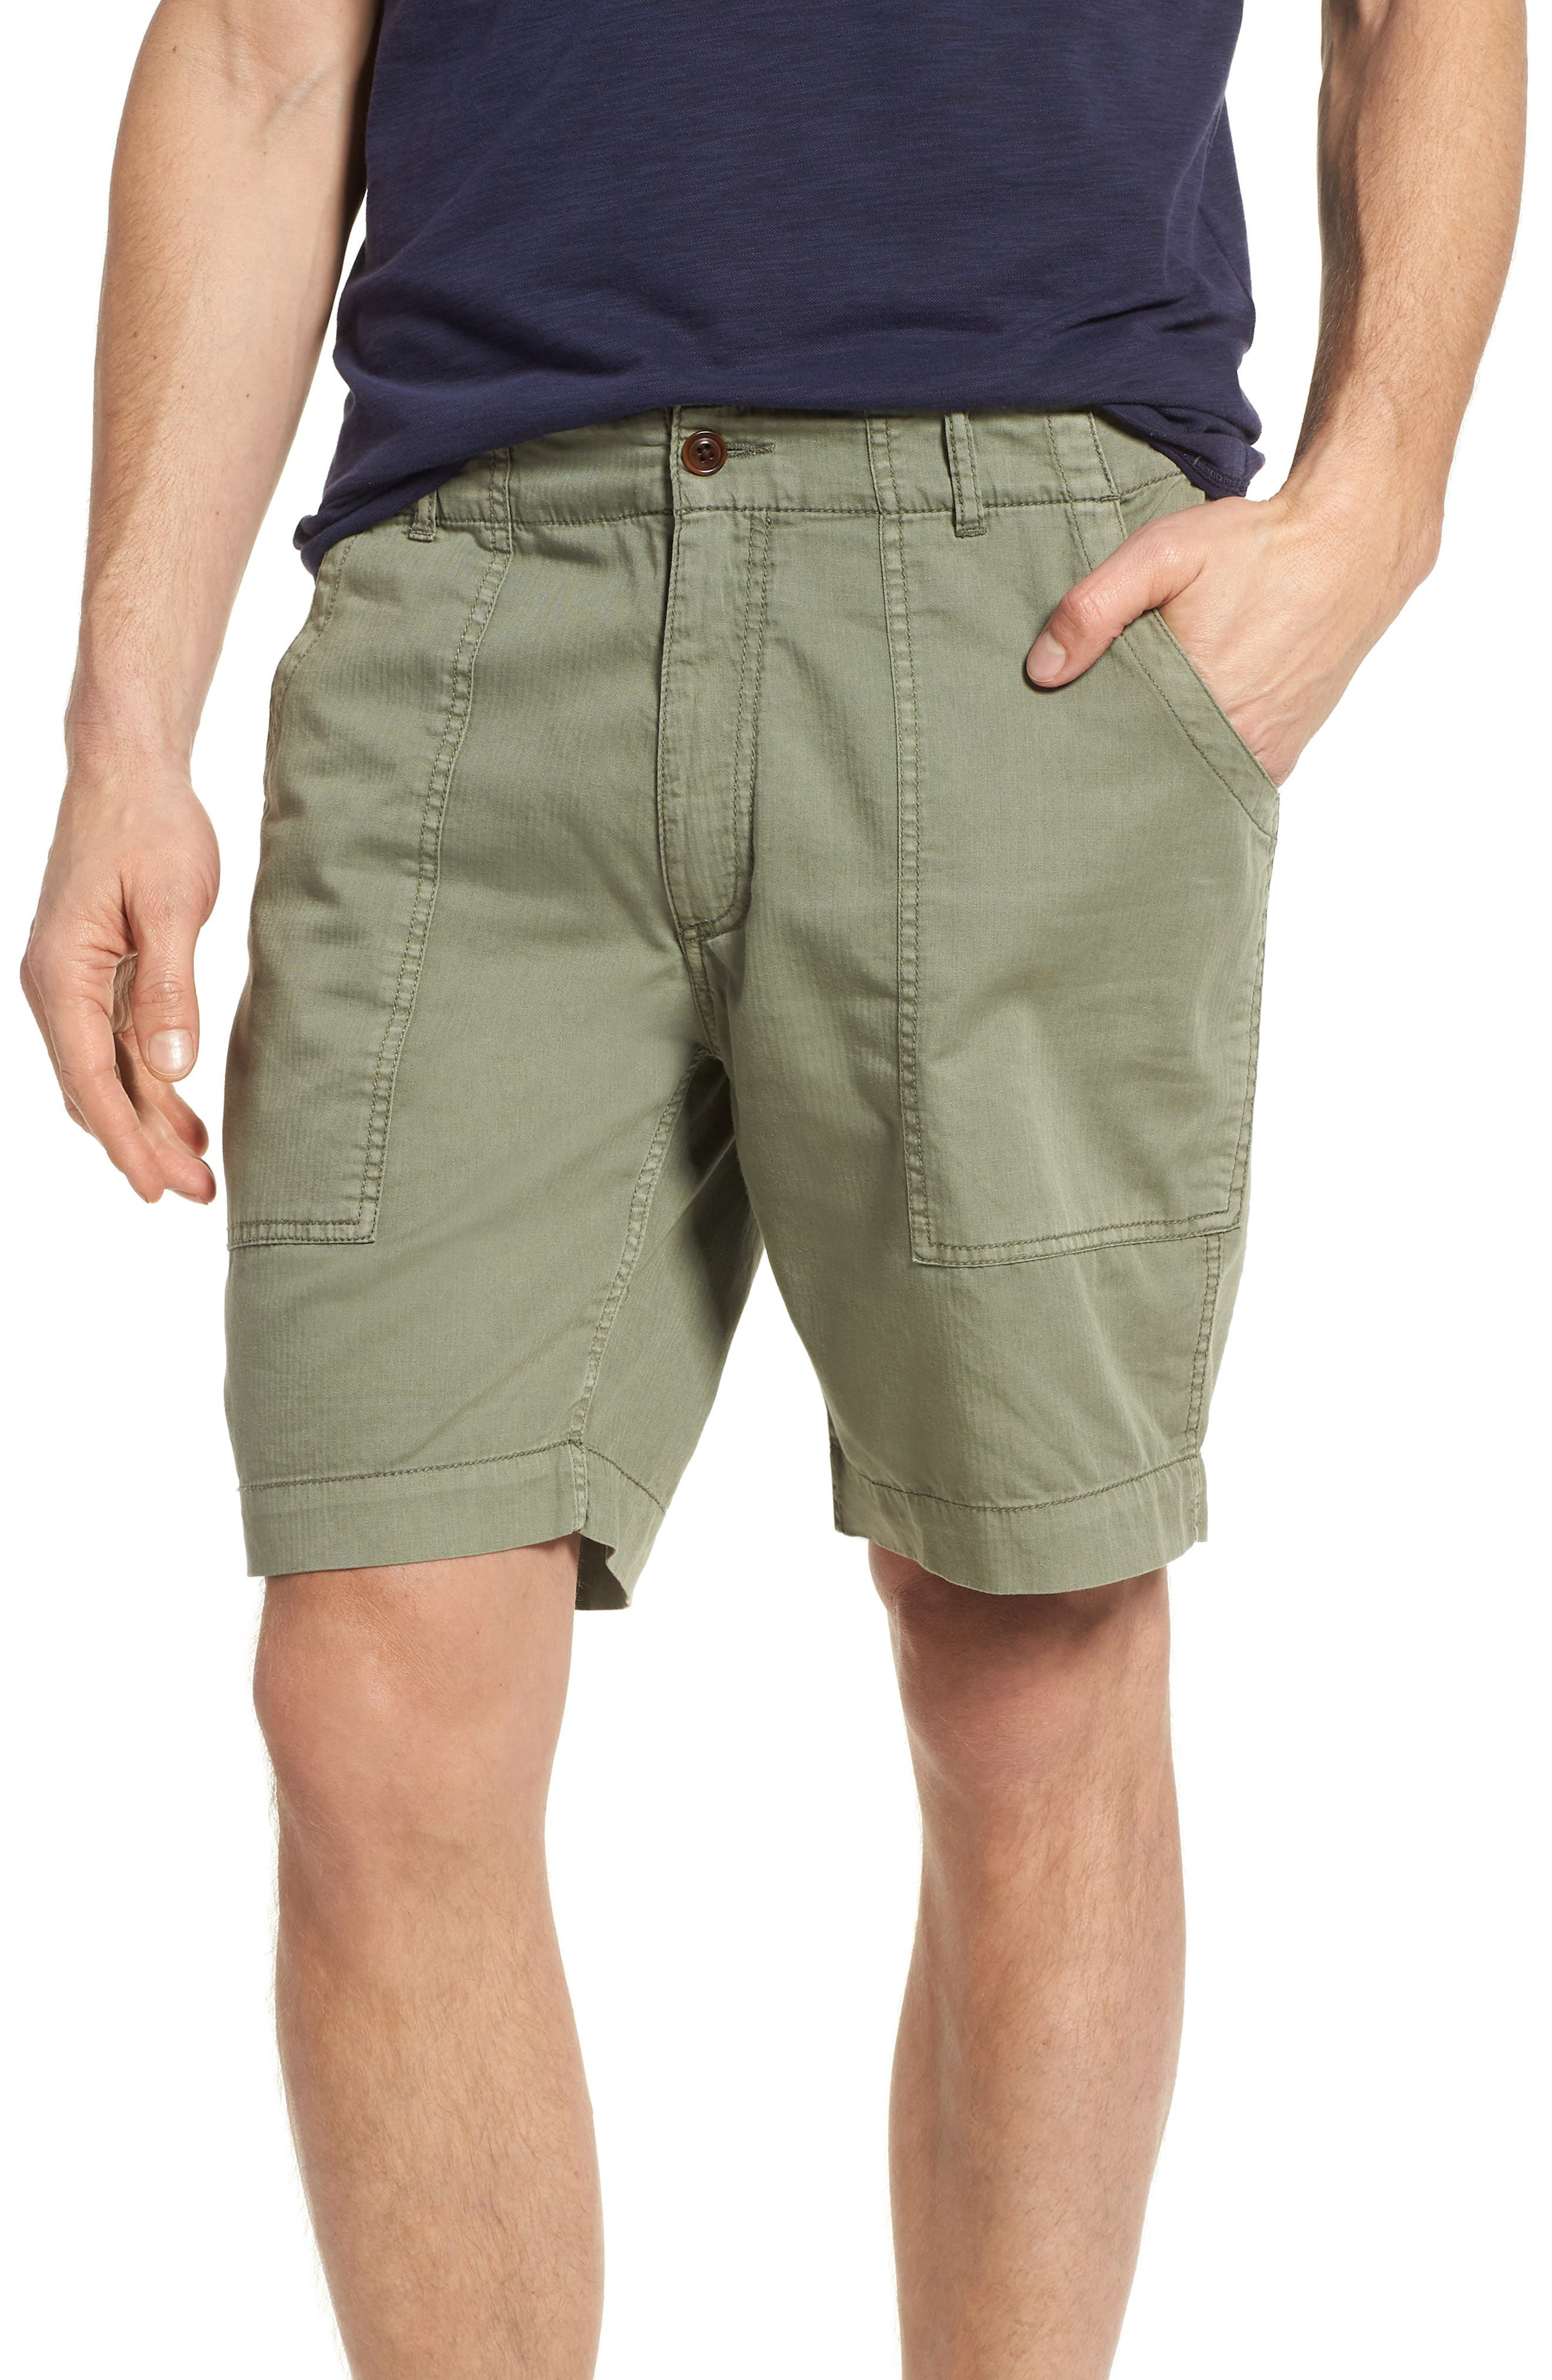 Radar Camp Shorts,                         Main,                         color, Olive